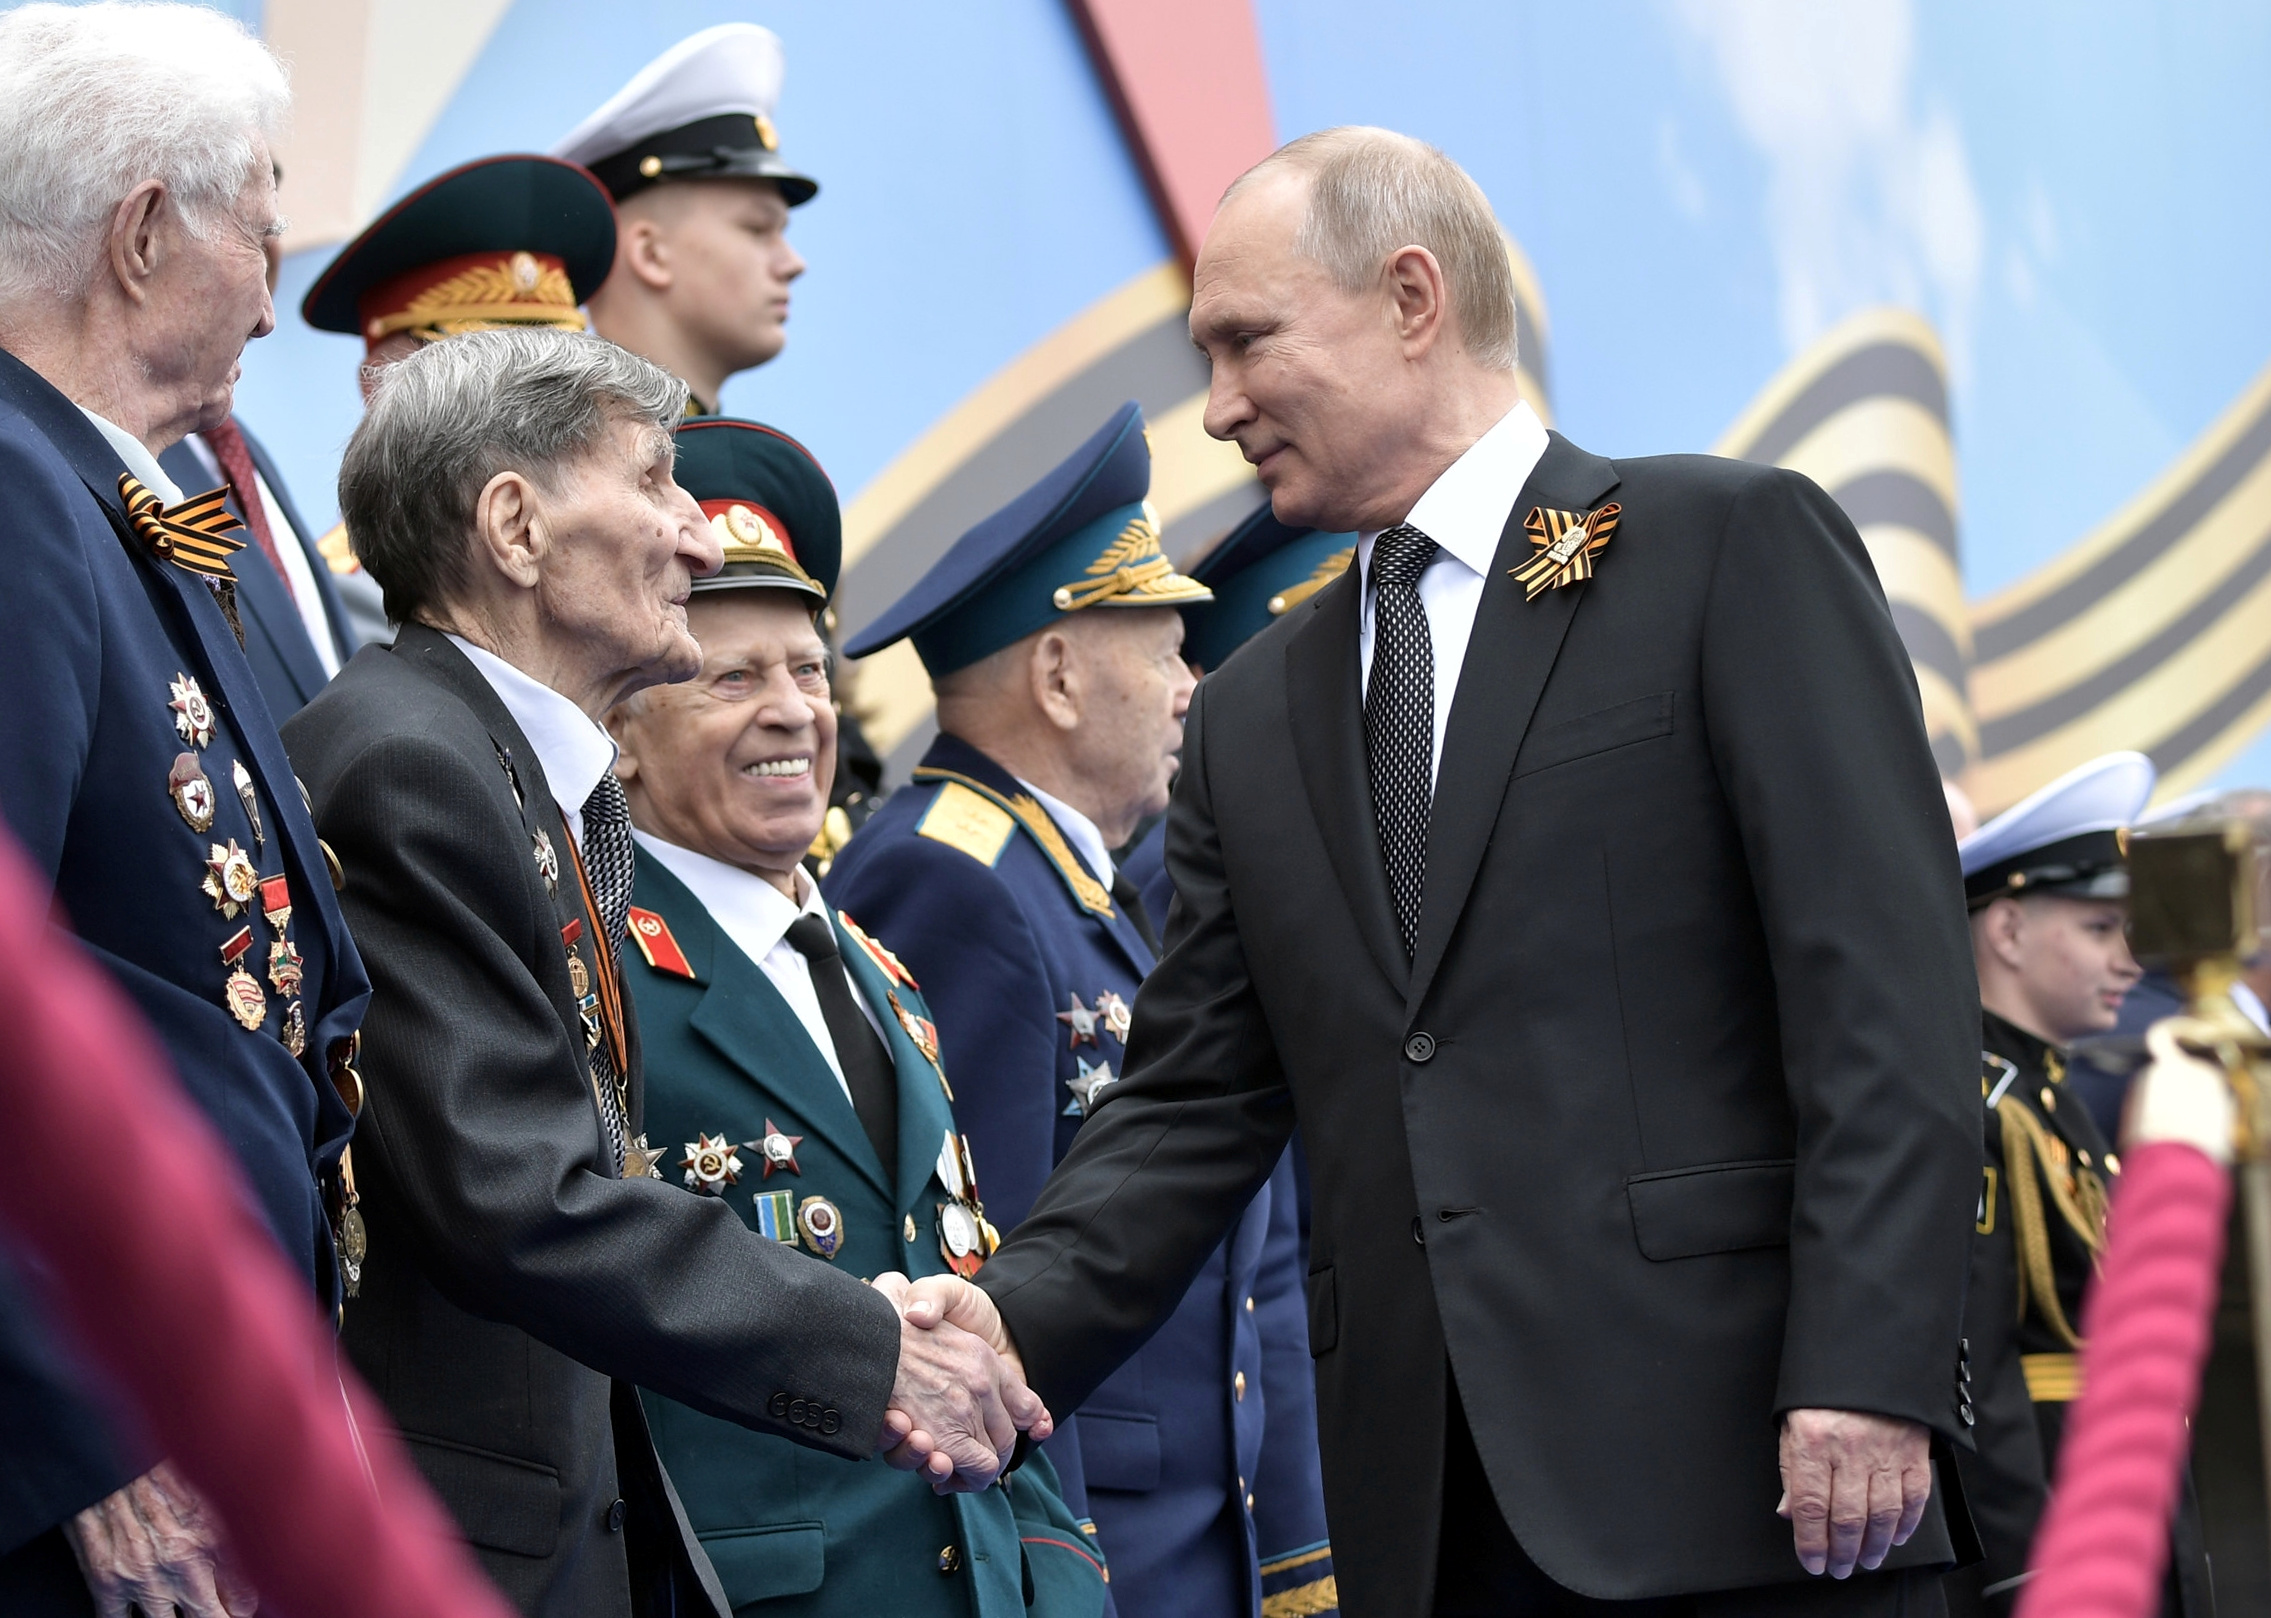 2019-05-09T084306Z_708031095_RC1B0A5AB2C0_RTRMADP_3_WW2-ANNIVERSARY-RUSSIA-PARADE